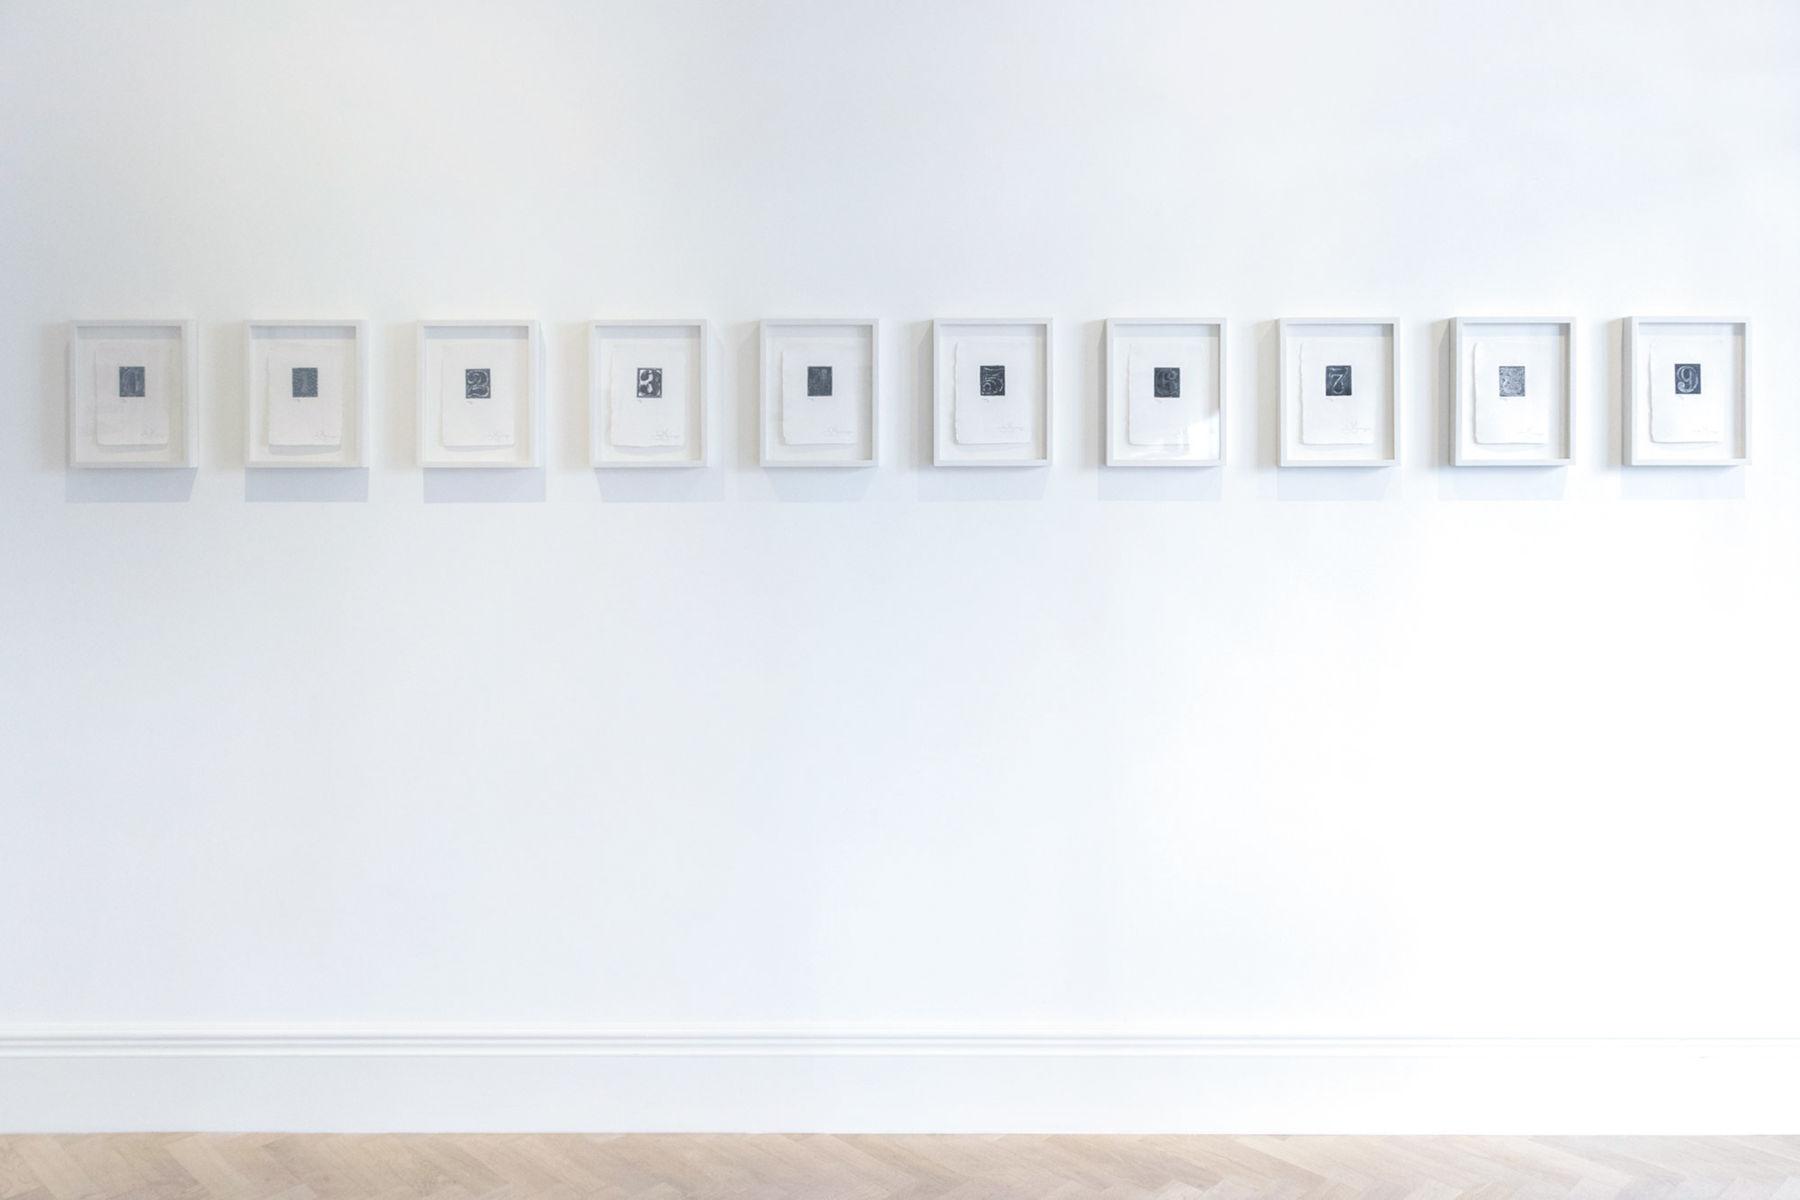 Lyndsey Ingram Wall of Small 1